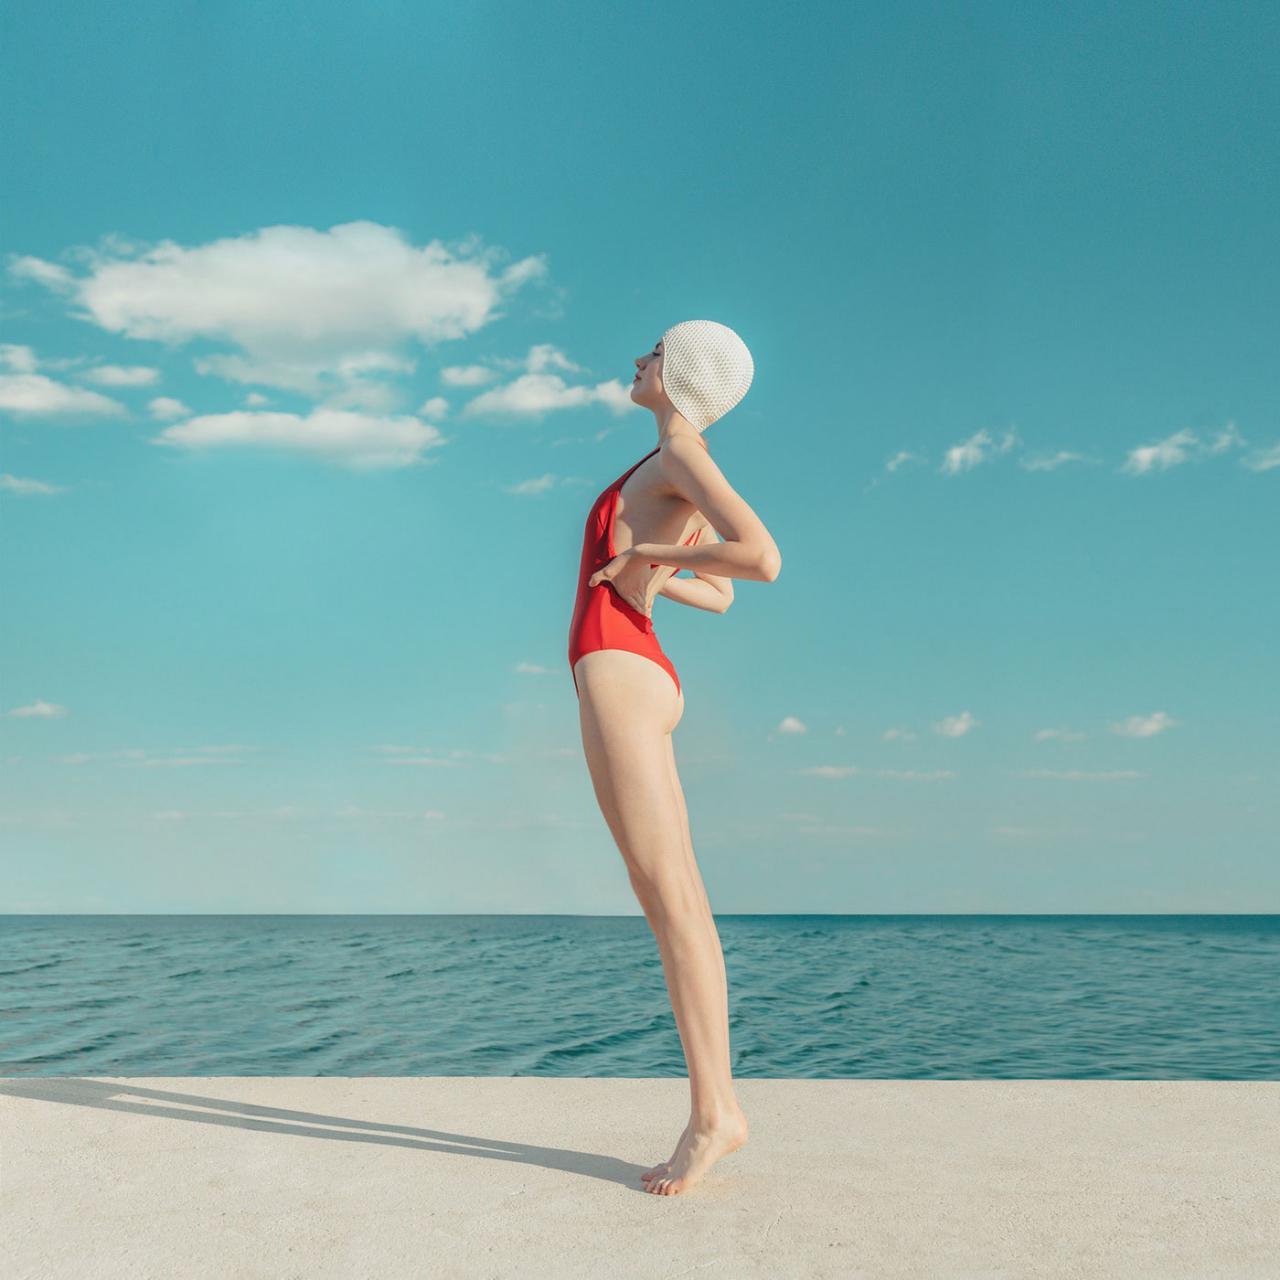 Eszter Sarah 人像摄影作品 Swimmers(配色很棒) 时尚图库 第11张